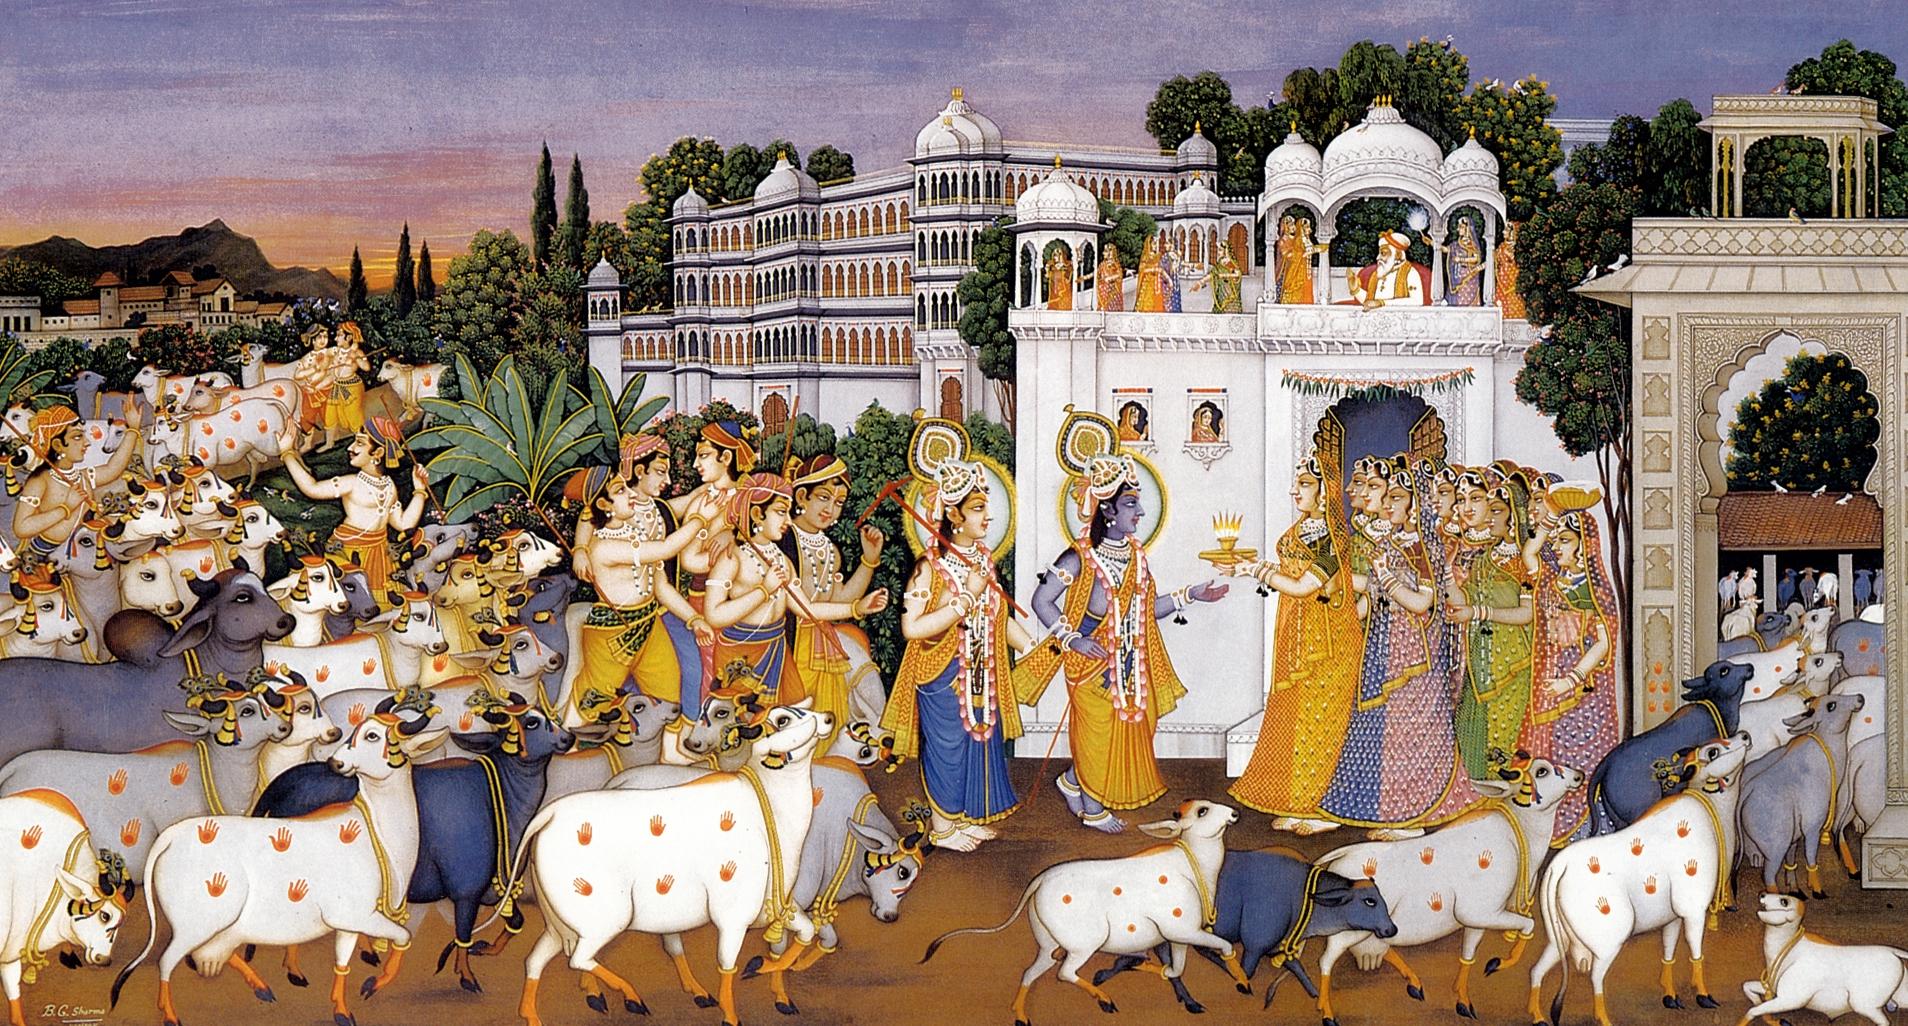 Sharma-village-cows-krishna-gopies-gopas-gopas-cowherd-men